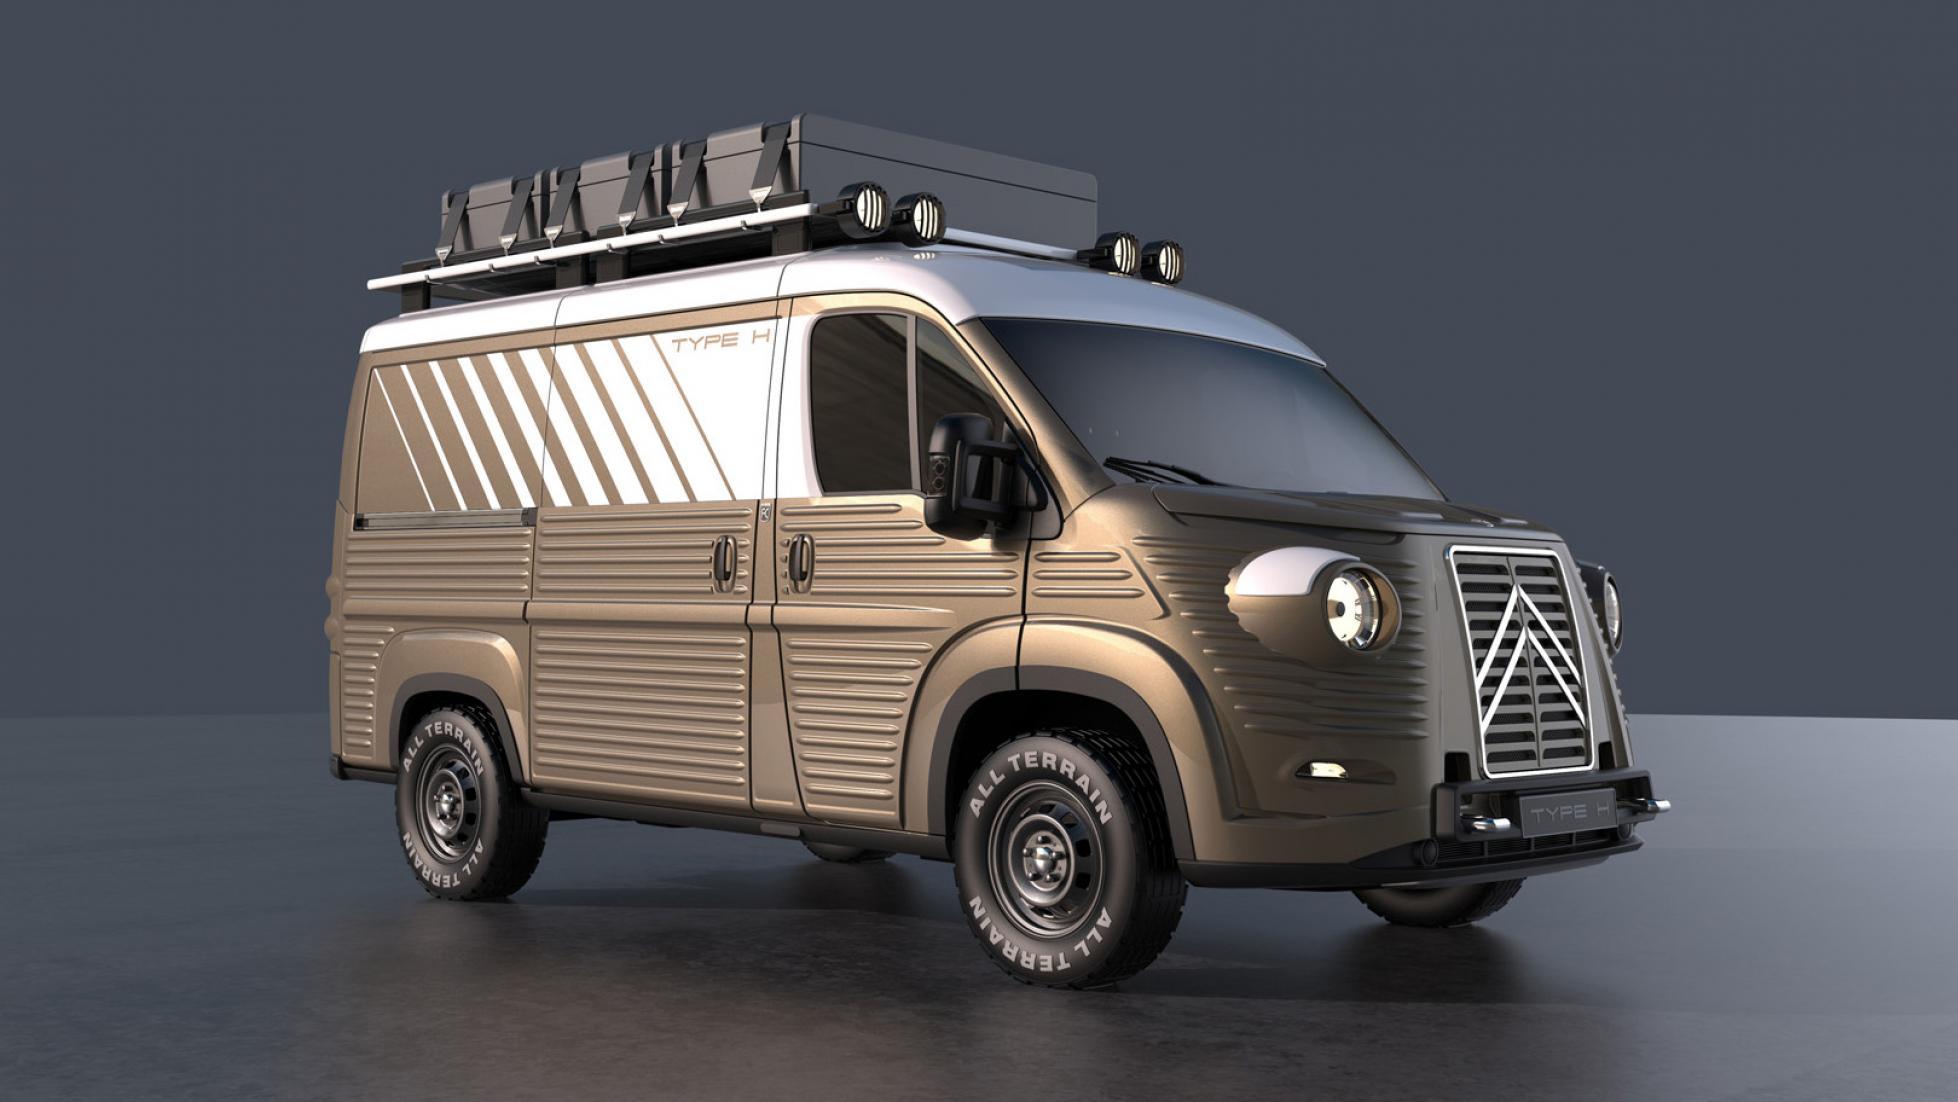 Das Revival Des Legendaren Citroen H Van